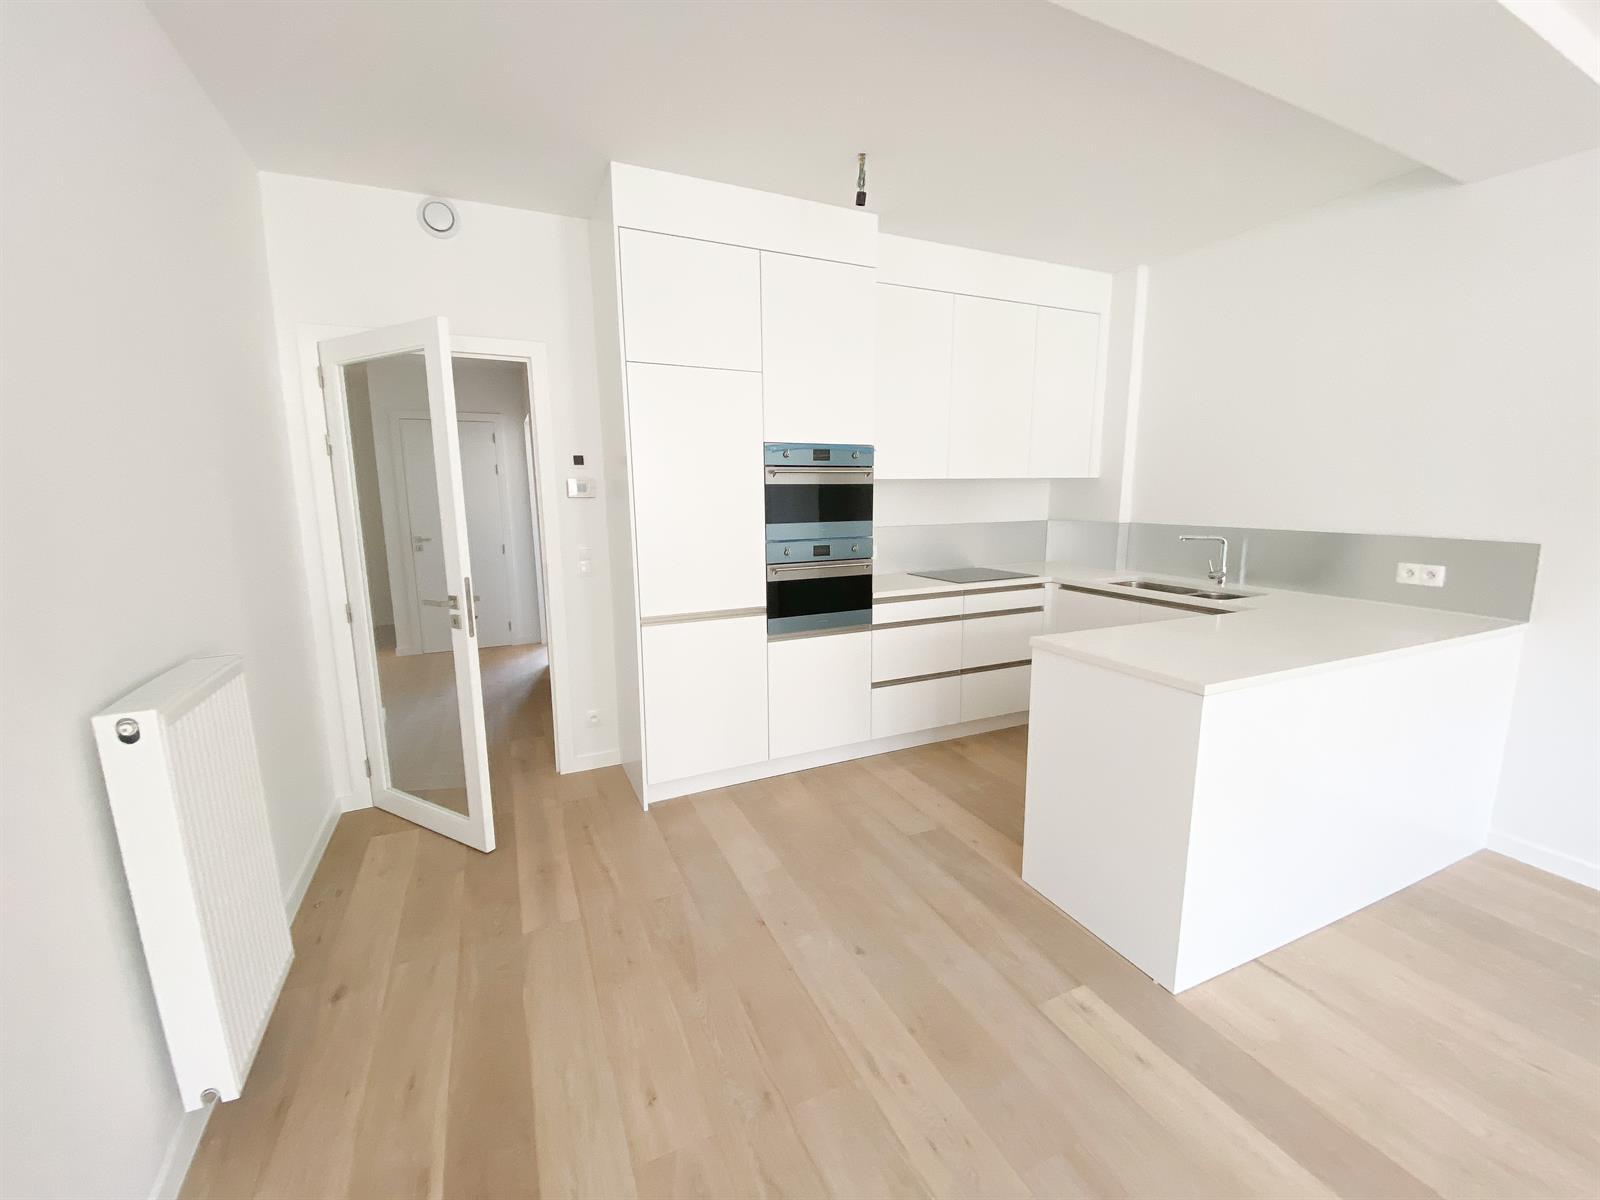 Duplex - Liège - #4045836-2